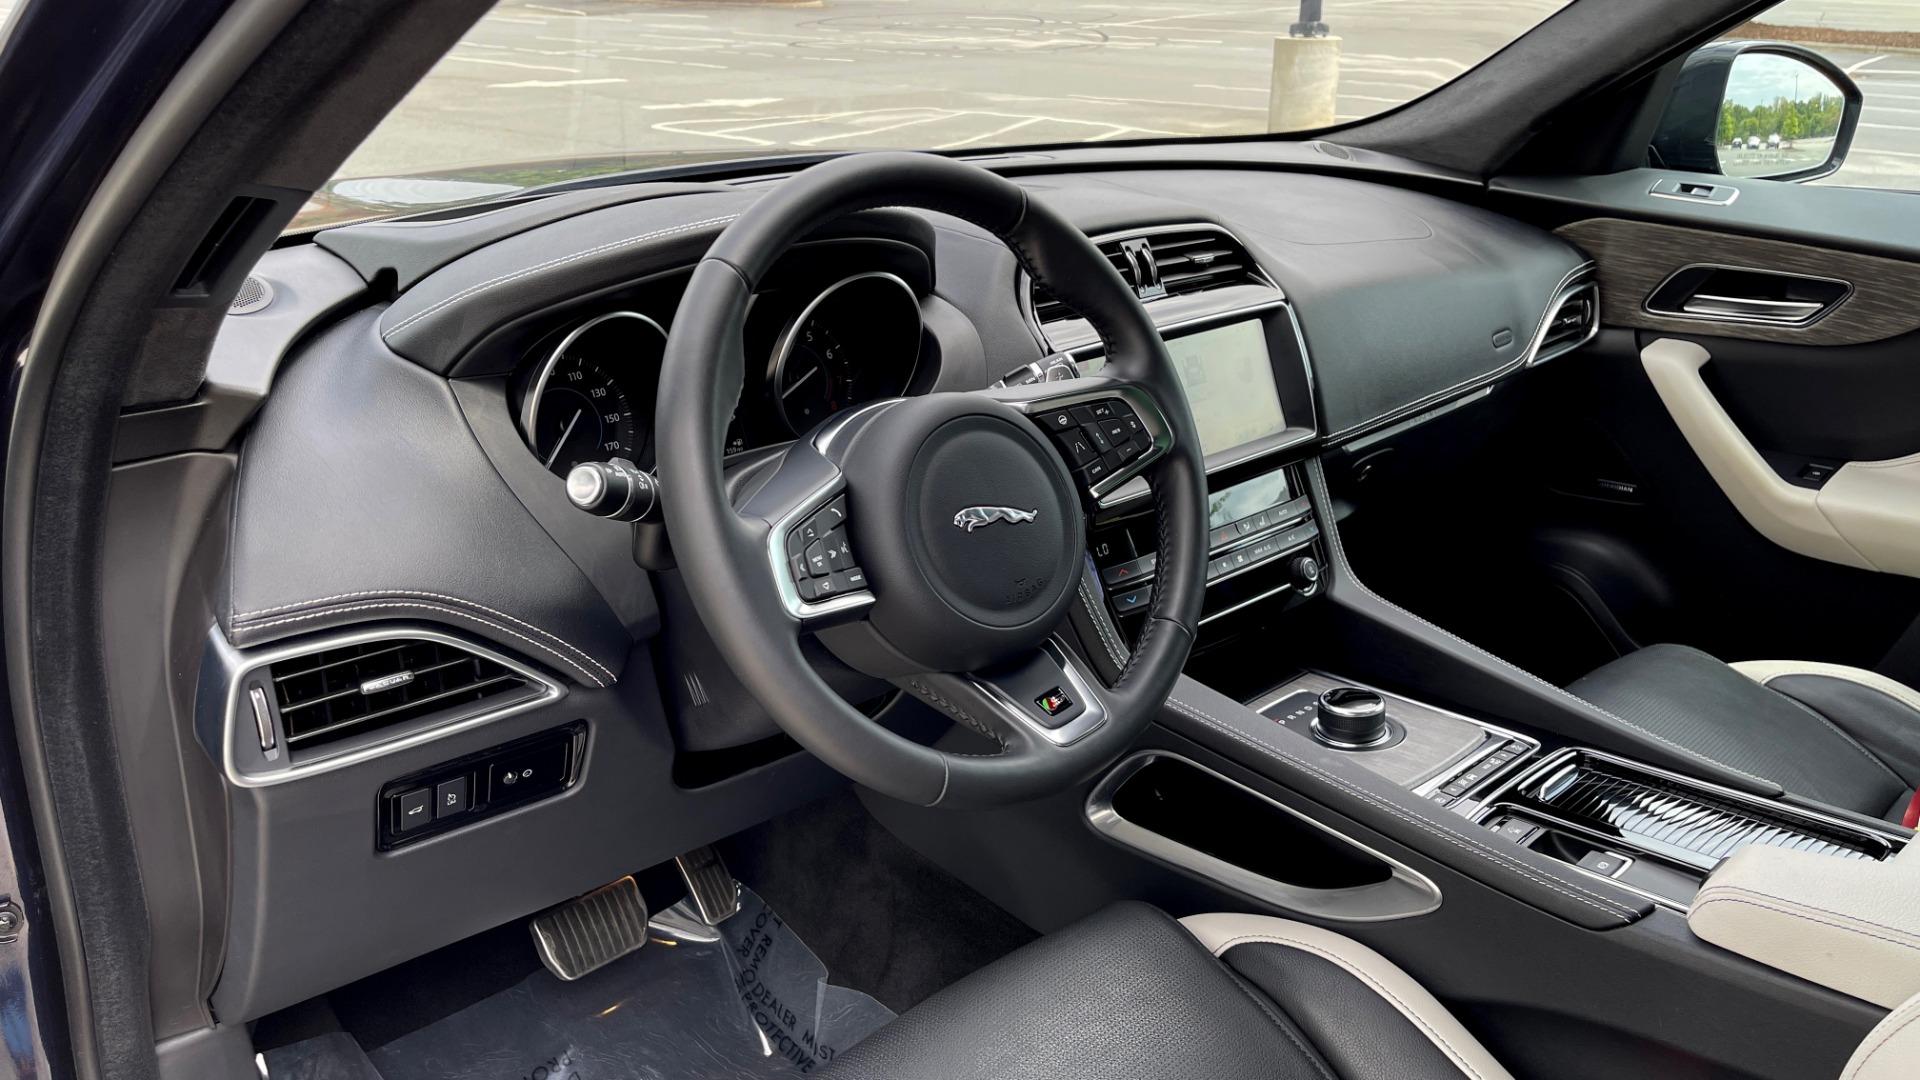 Used 2019 Jaguar F-PACE S / DRIVE PKG / BSA / HUD / BLACK EXT PKG / REARVIEW for sale $50,995 at Formula Imports in Charlotte NC 28227 28